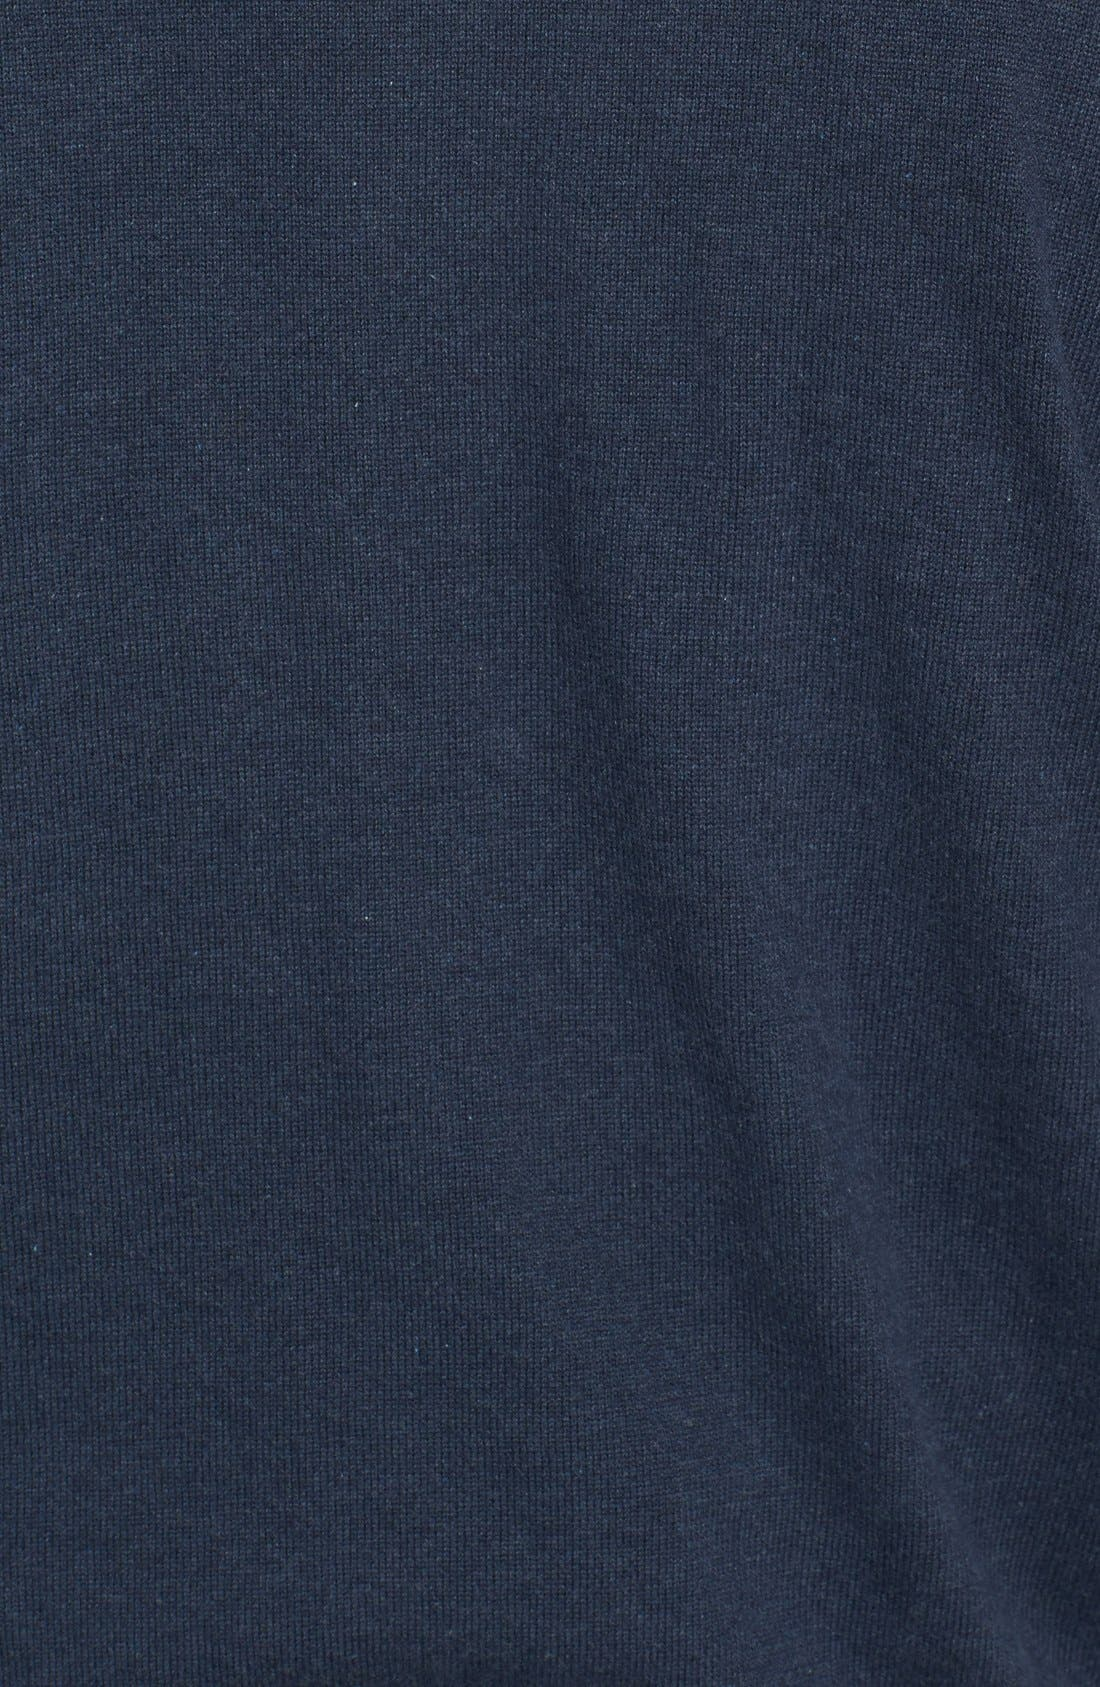 CUTTER & BUCK,                             Broadview Half Zip Sweater,                             Alternate thumbnail 3, color,                             480